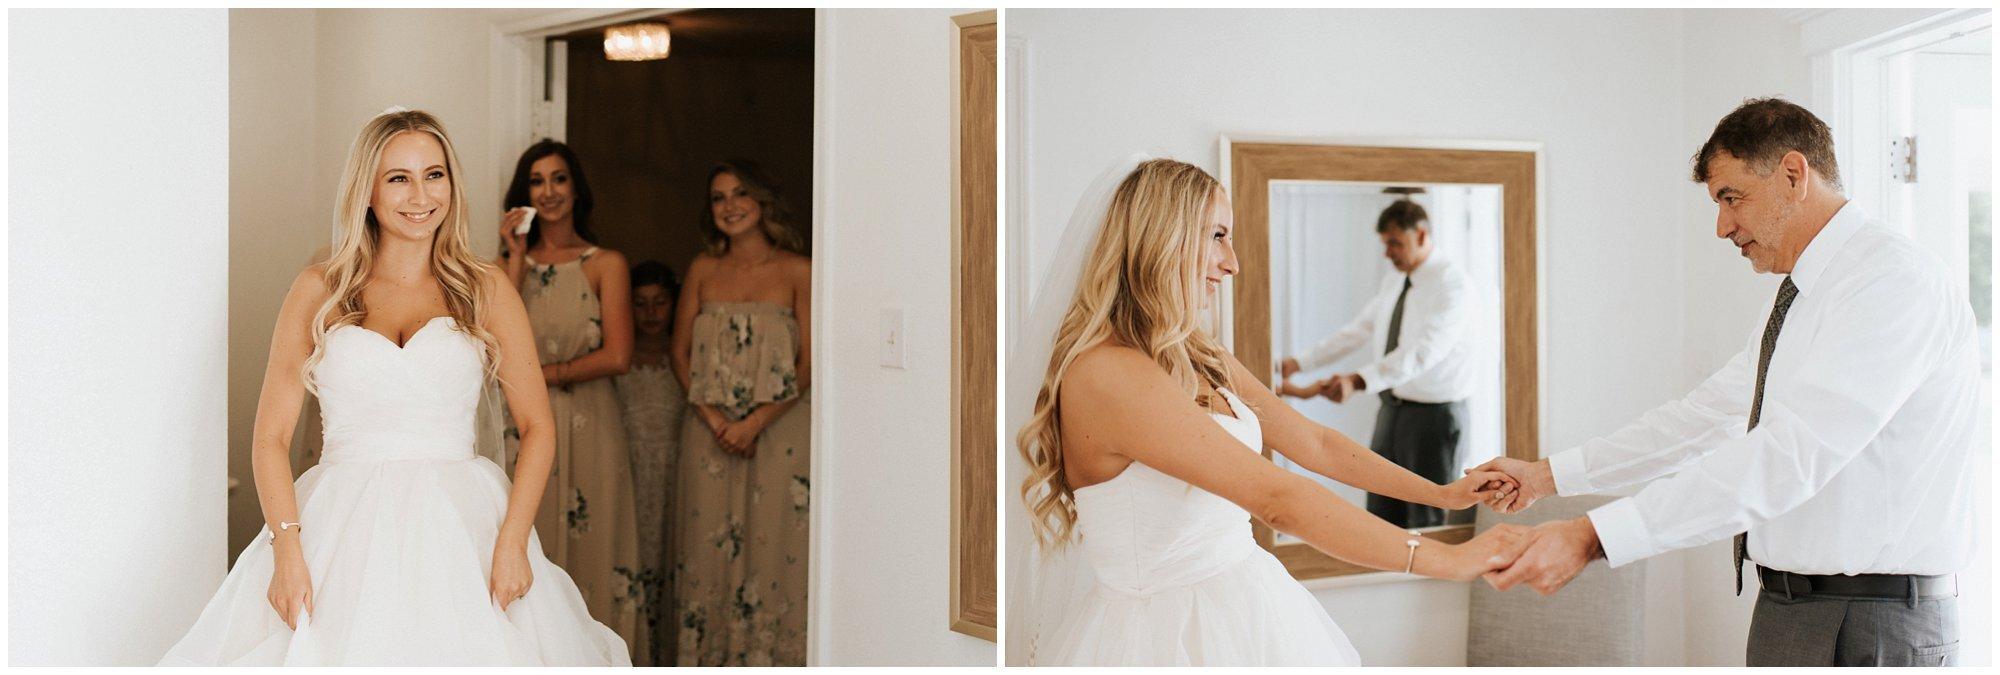 Wedgewood_Lindsay_Groves-Arizona-Wedding-Photographer-M+C_0007.jpg